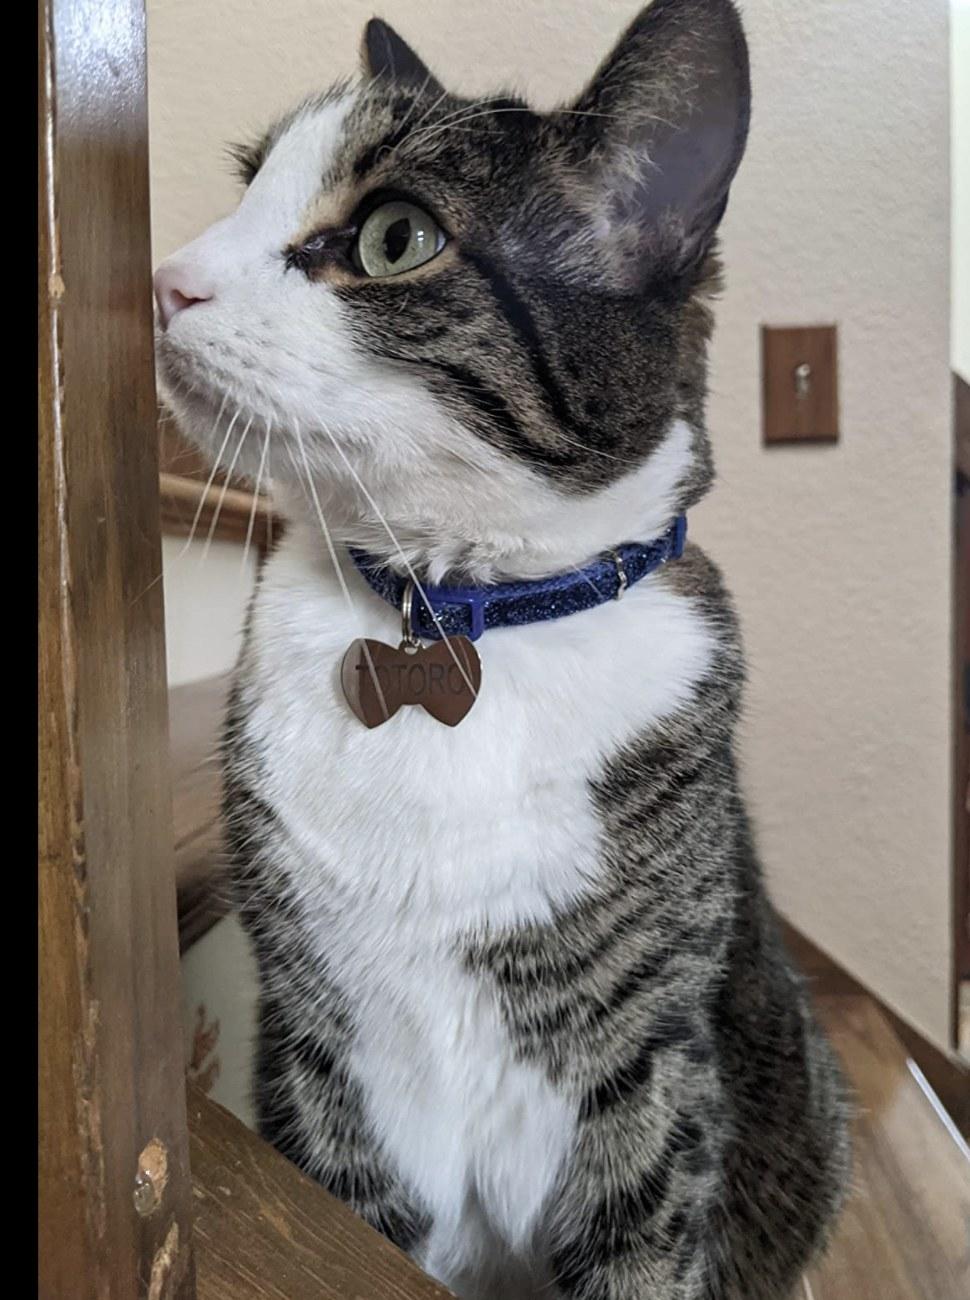 a cat wearing a bowtie shaped cat ID tag